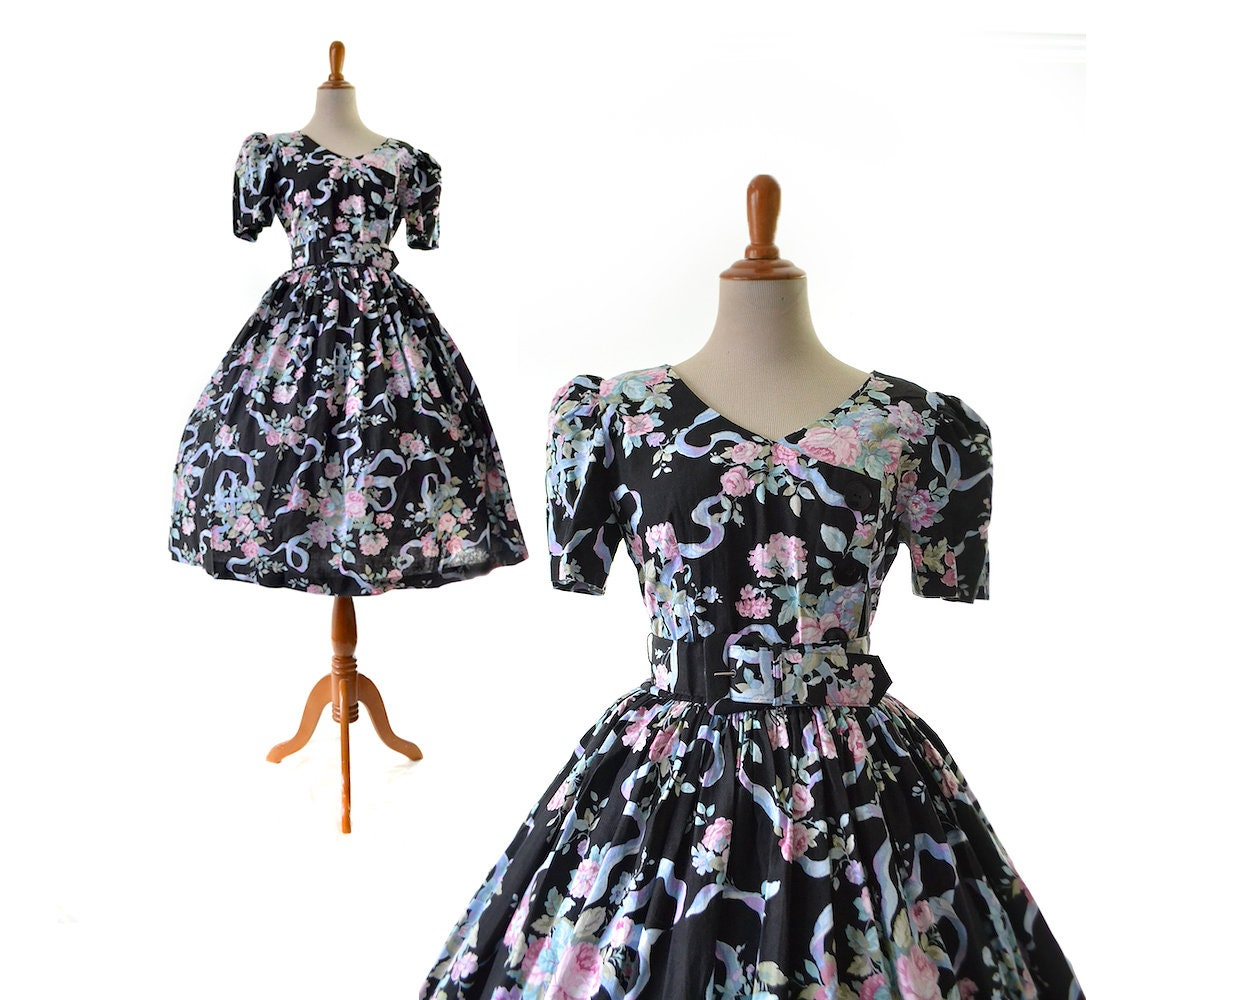 80s Dresses | Casual to Party Dresses 1950S Dress Floral Print Black 50S Dark Cotton Rose Pinup Rockabilly Swing Women Dreses. Vintage Dresses $7.99 AT vintagedancer.com